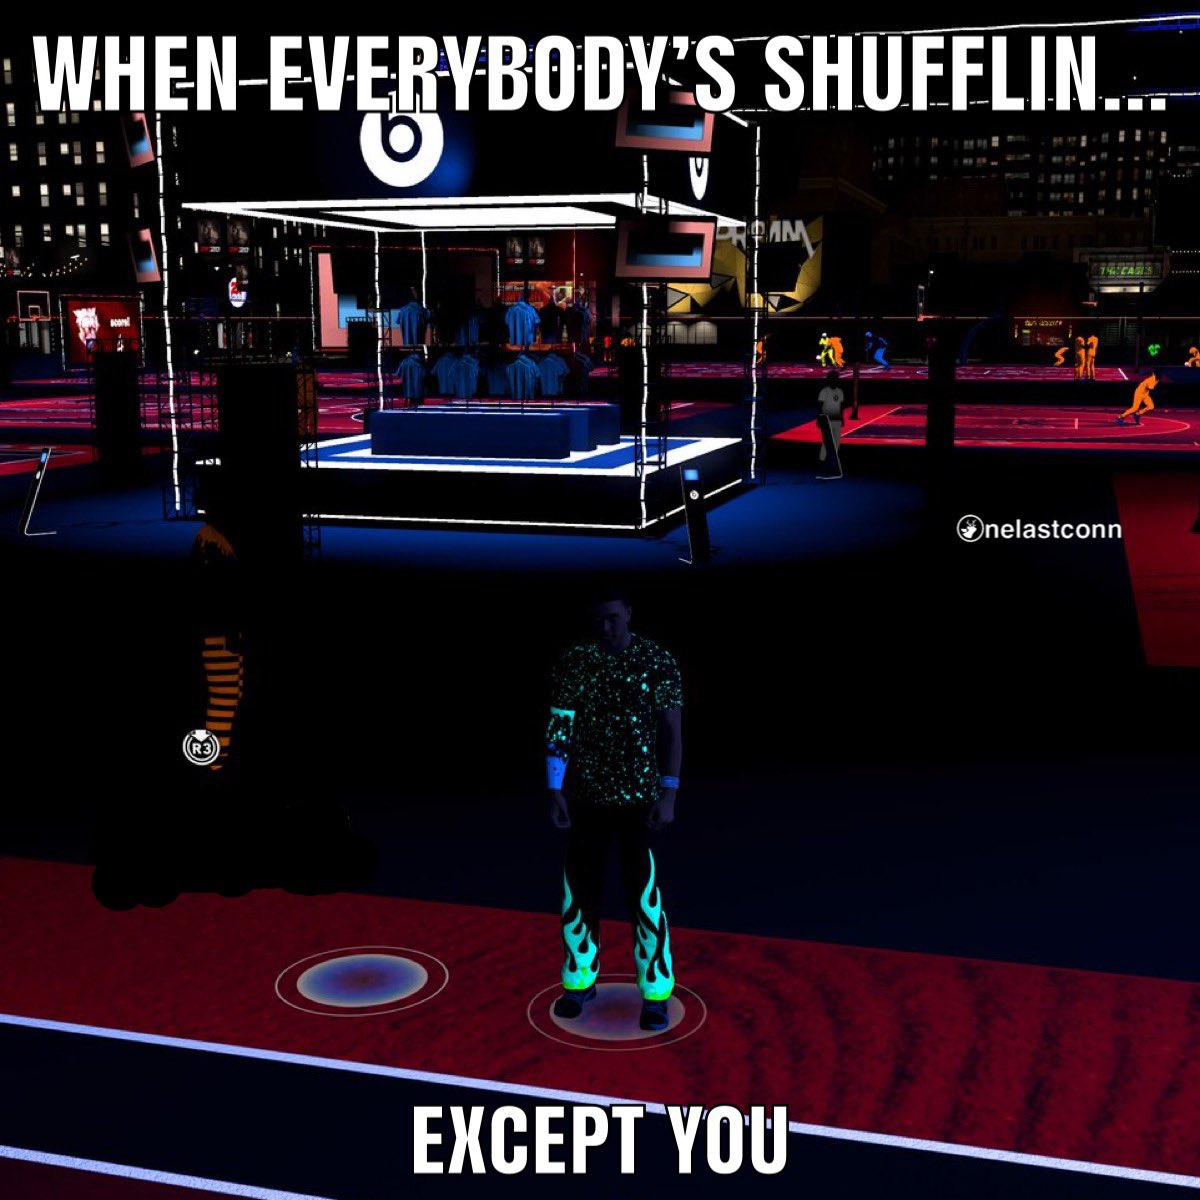 #beatsatnight #beats #nba #nba2k20 #2k20 #playstation #ps4 #playstation4 #gaming #gamer #gamers #game #ballislife #basketball #basketballmemes #gamememes #2k #2ksports #blacklight #neighborhood #gamerlife #shuffle #gamerguy #meme #memes #memesdaily #dankmemes #memes#memepagepic.twitter.com/VeCTJbOLBS